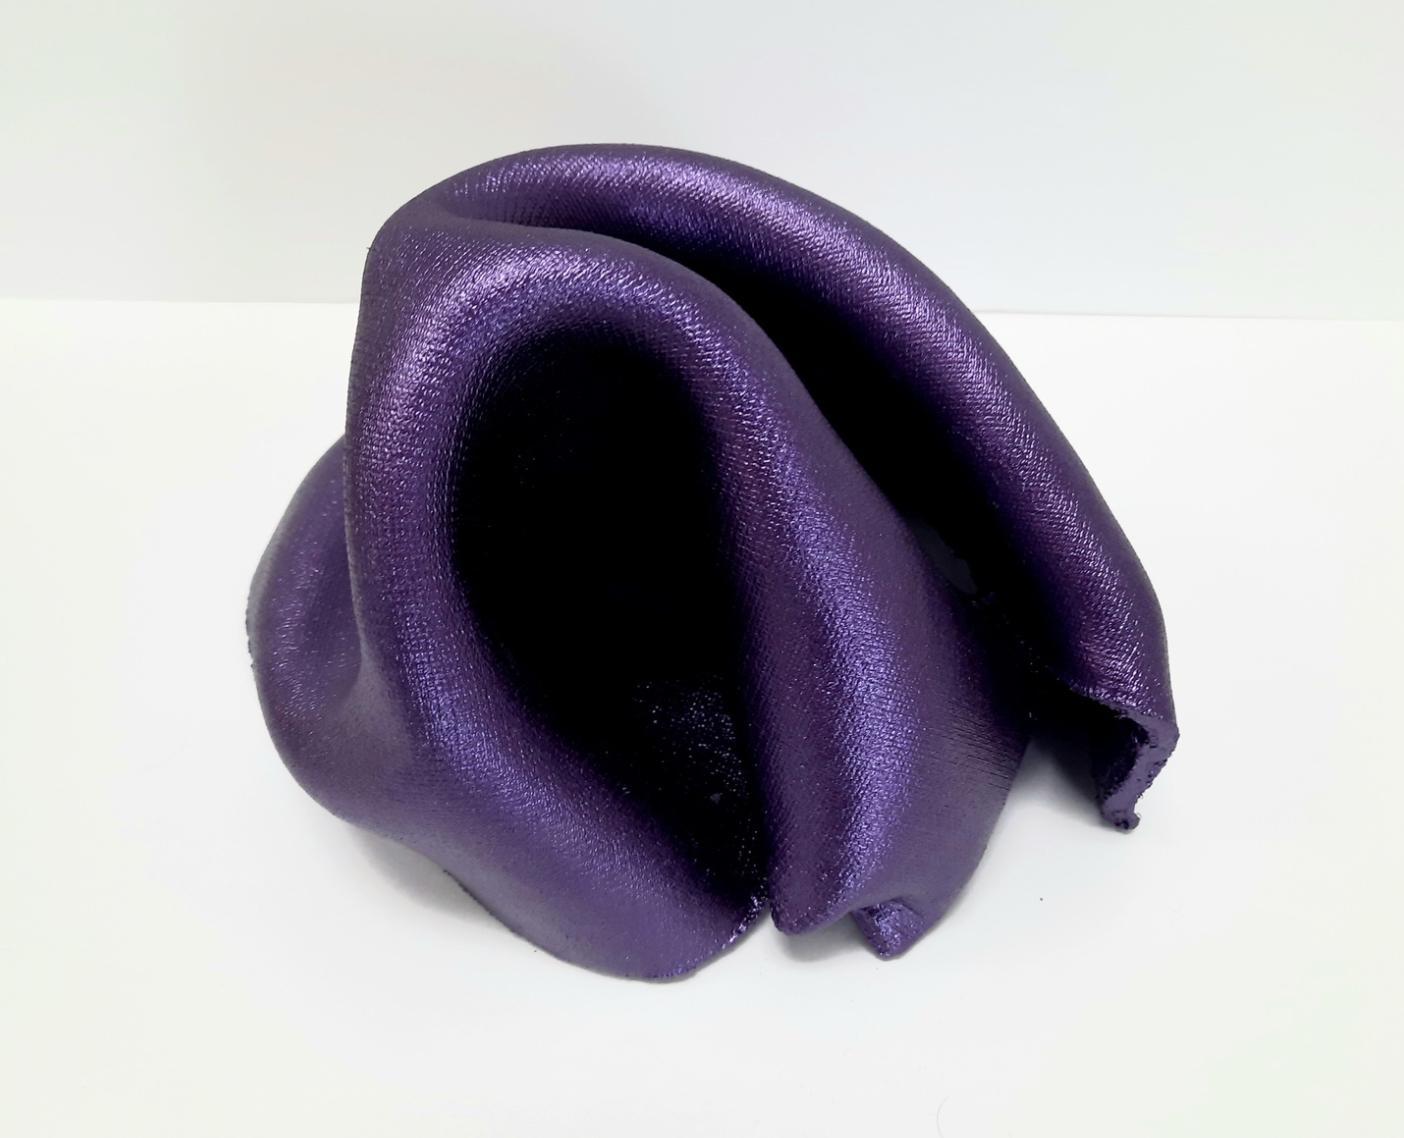 Sinuosity mini in Purple  (pop metallic smooth small sculpture abstract slick)